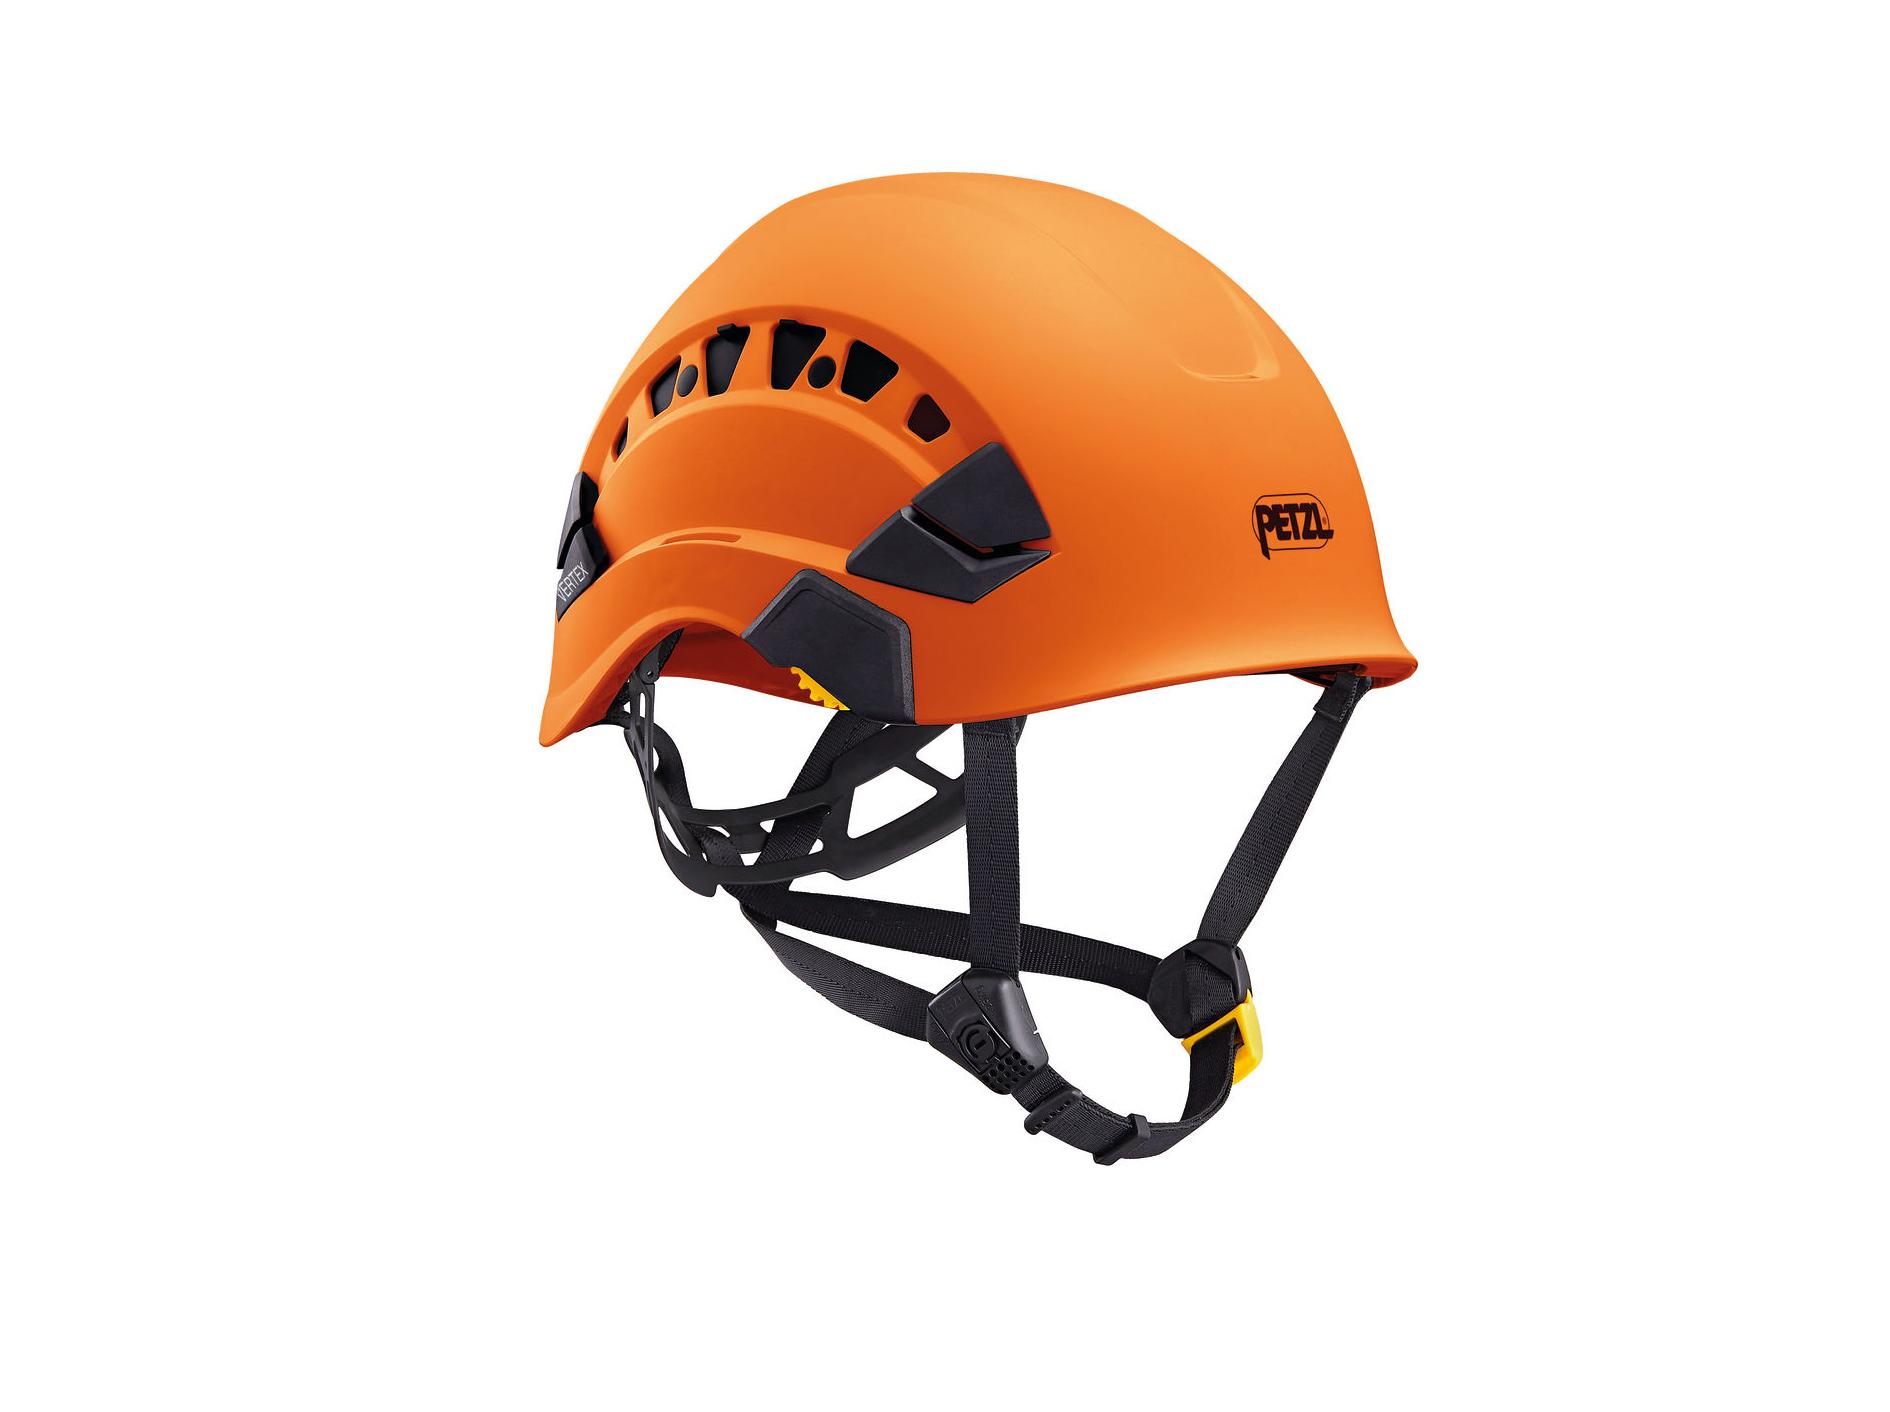 Helmet Protection Vertex Vent Petzl New 2019